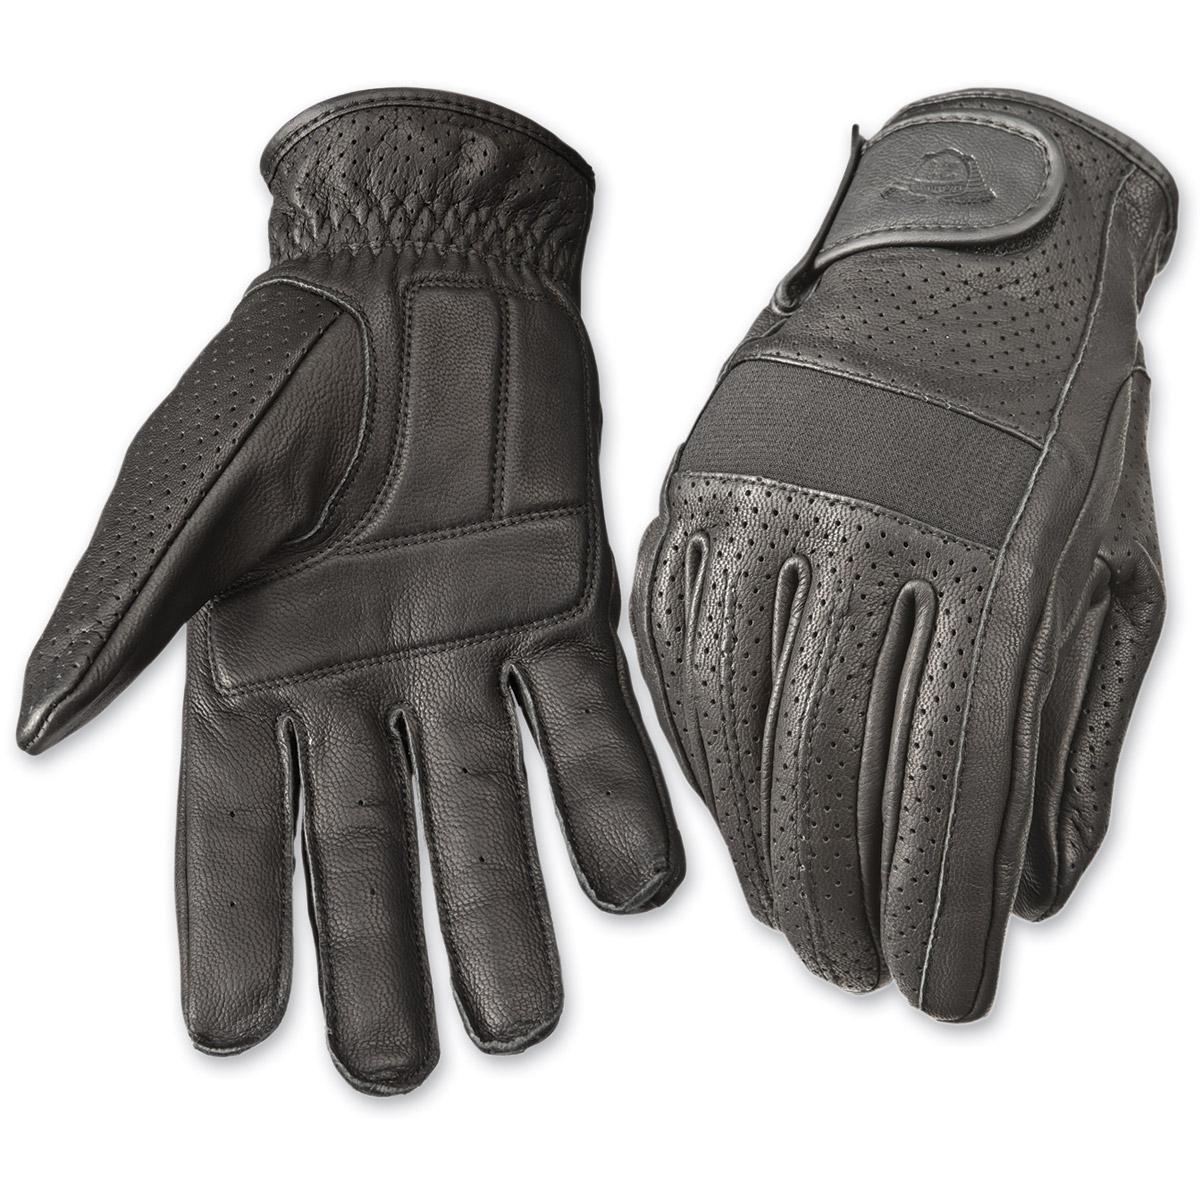 Highway 21 Men's Jab Perforated Black Leather Gloves